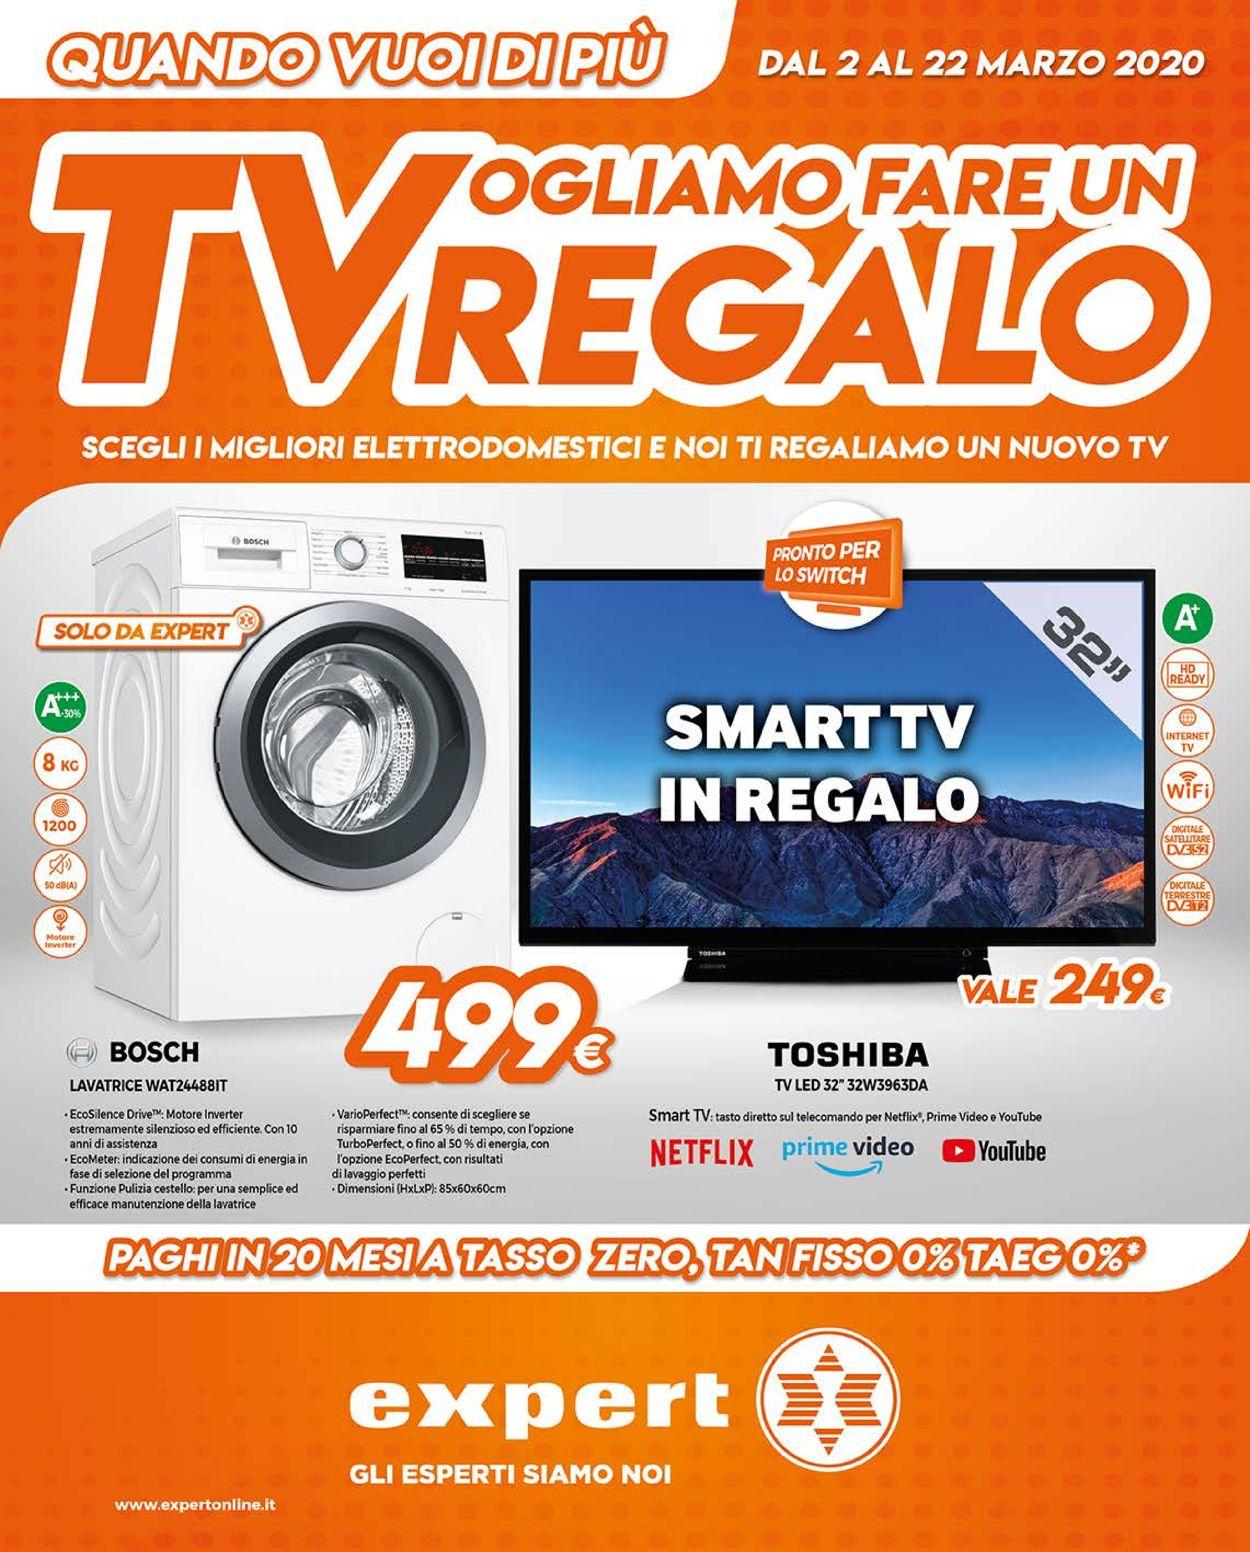 Volantino Expert - Offerte 02/03-22/03/2020